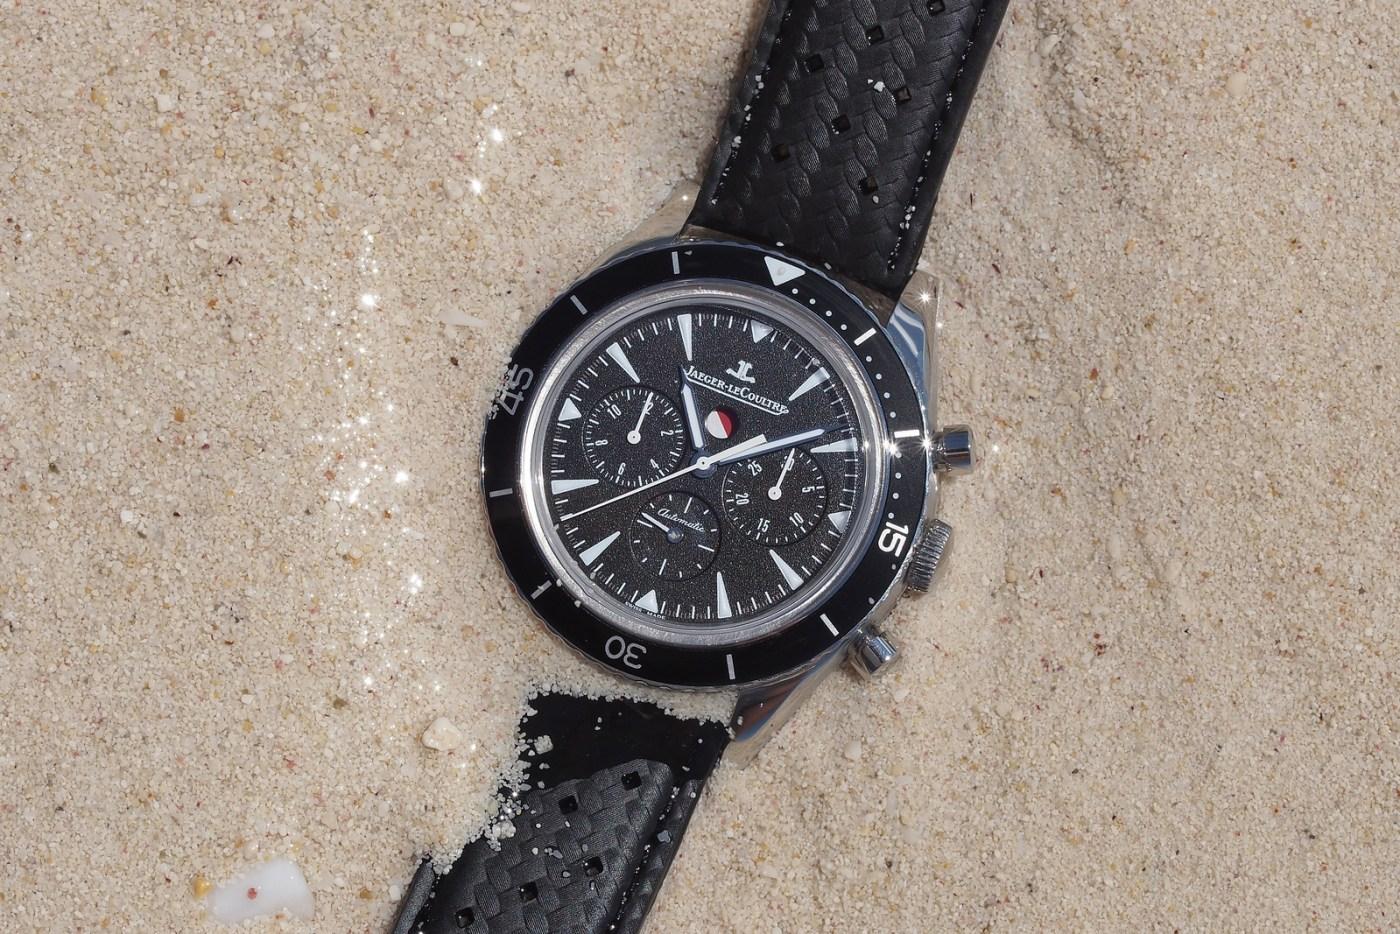 Jaeger-LeCoultre Deep Sea Chronograph buried